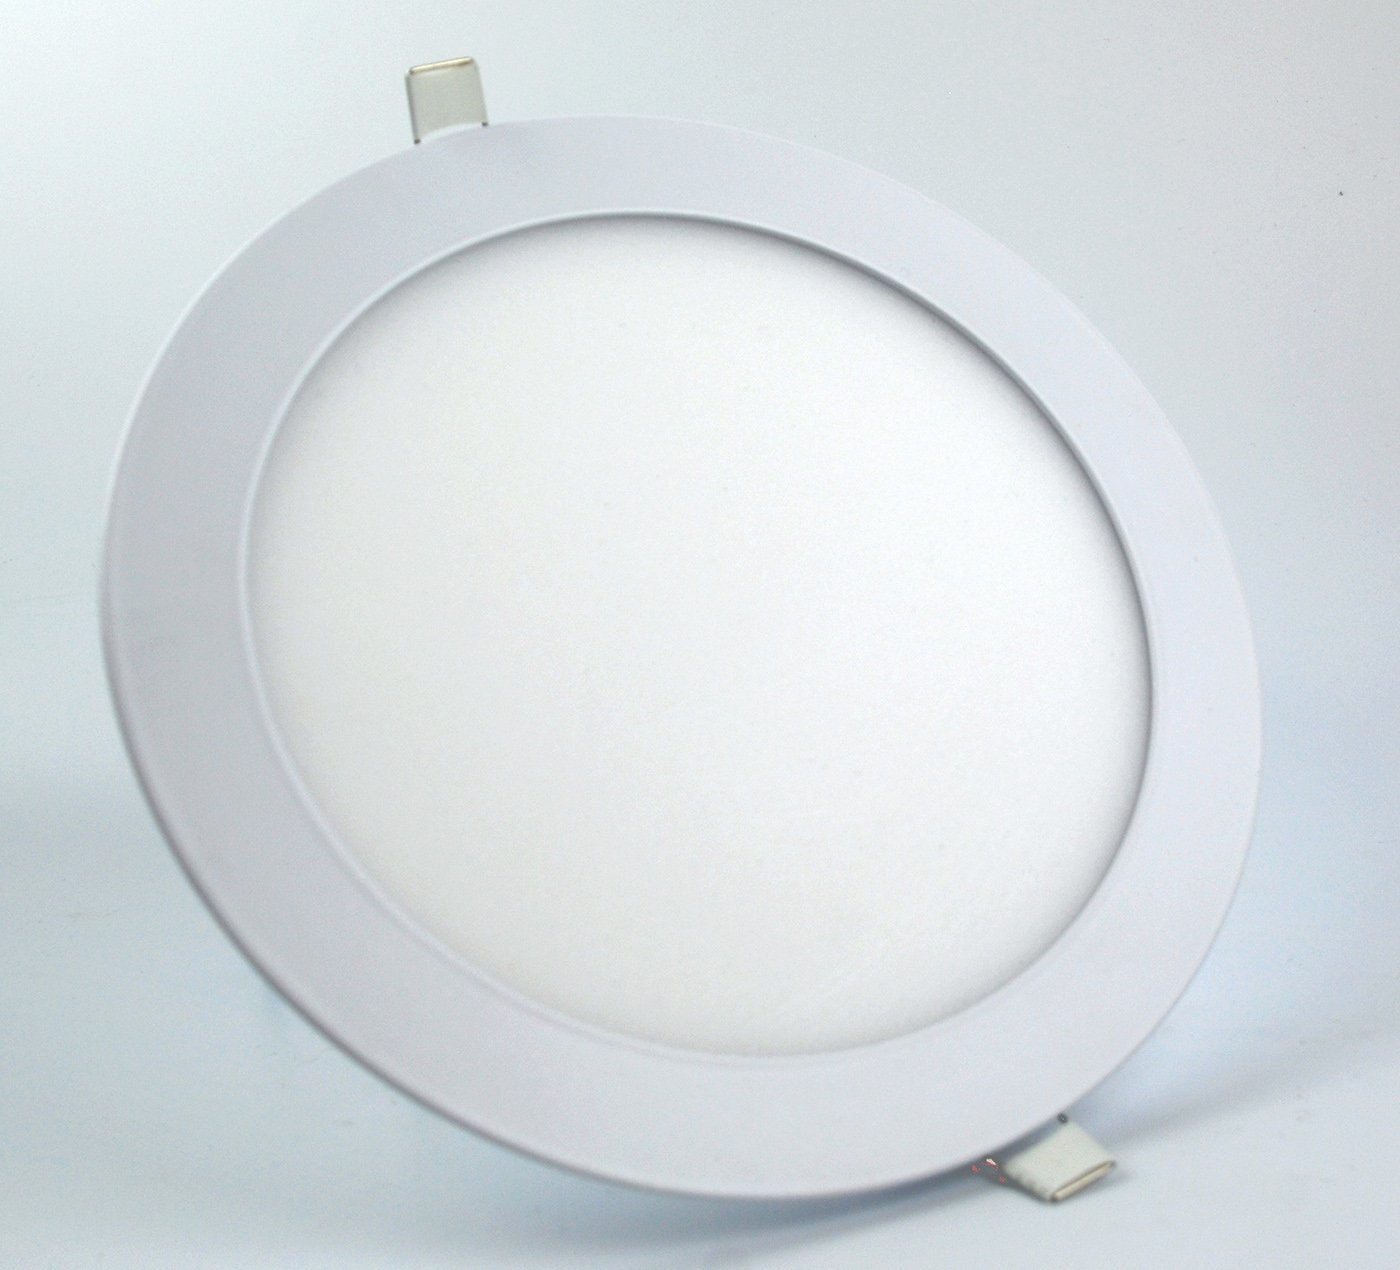 Luces led para techo luces led redondas para la decoracin - Iluminacion led cocina downlight ...